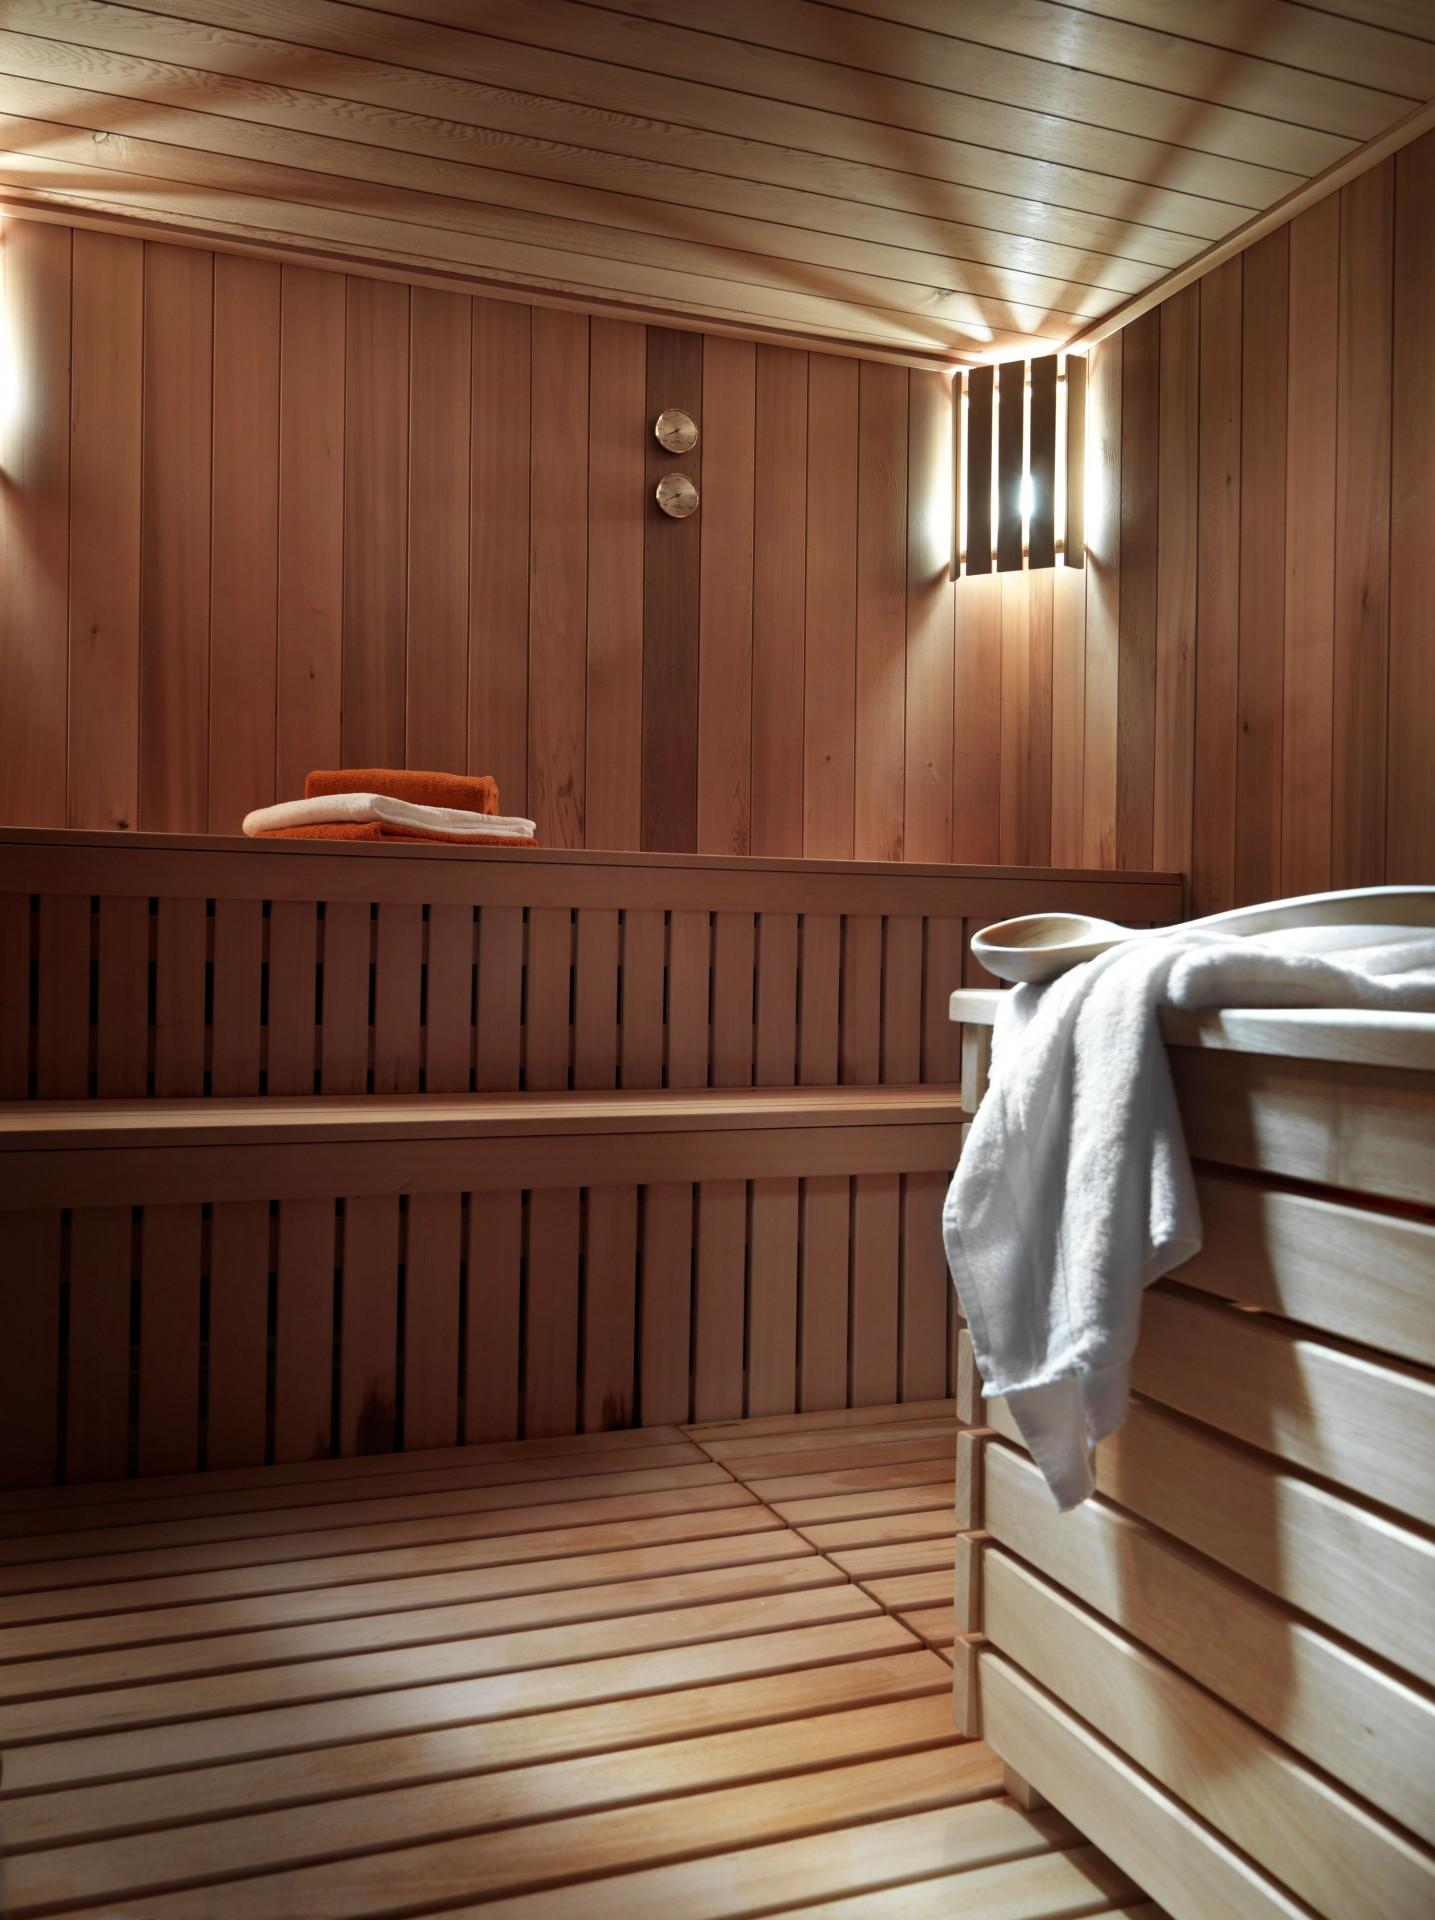 Samoens Location Appartement Luxe Salis Sauna